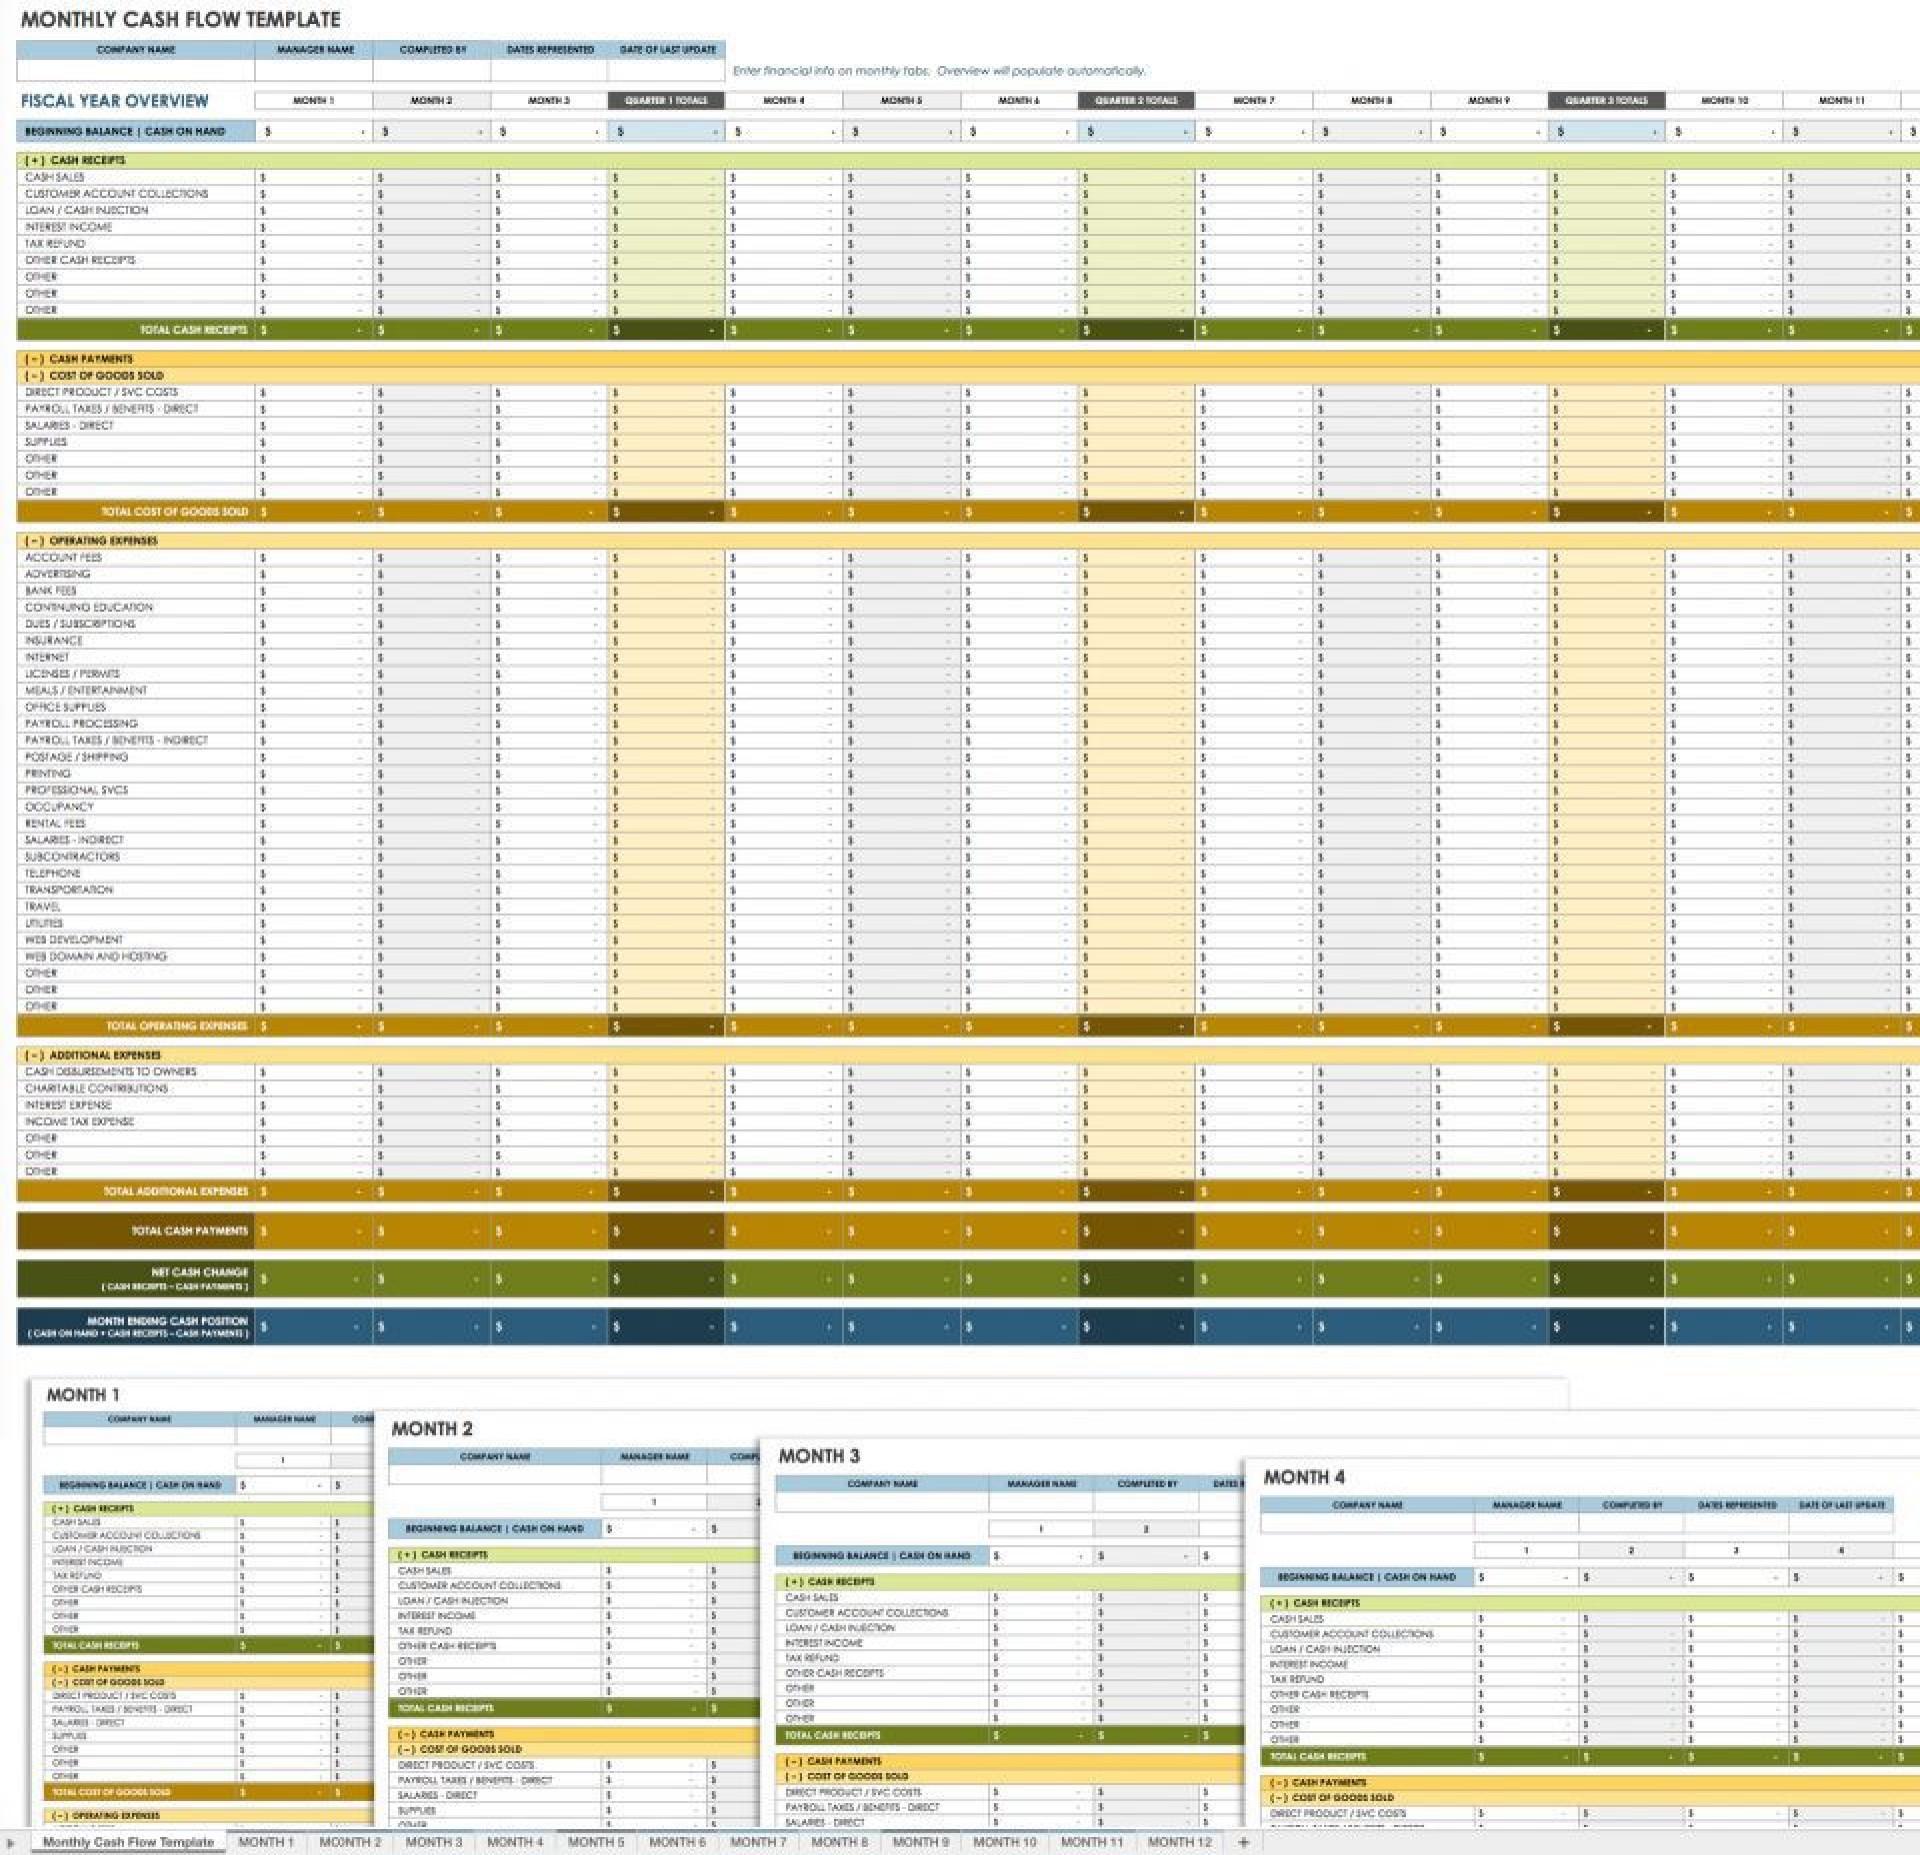 006 Remarkable Cash Flow Sample Excel Image  Spreadsheet Free Forecast Template1920